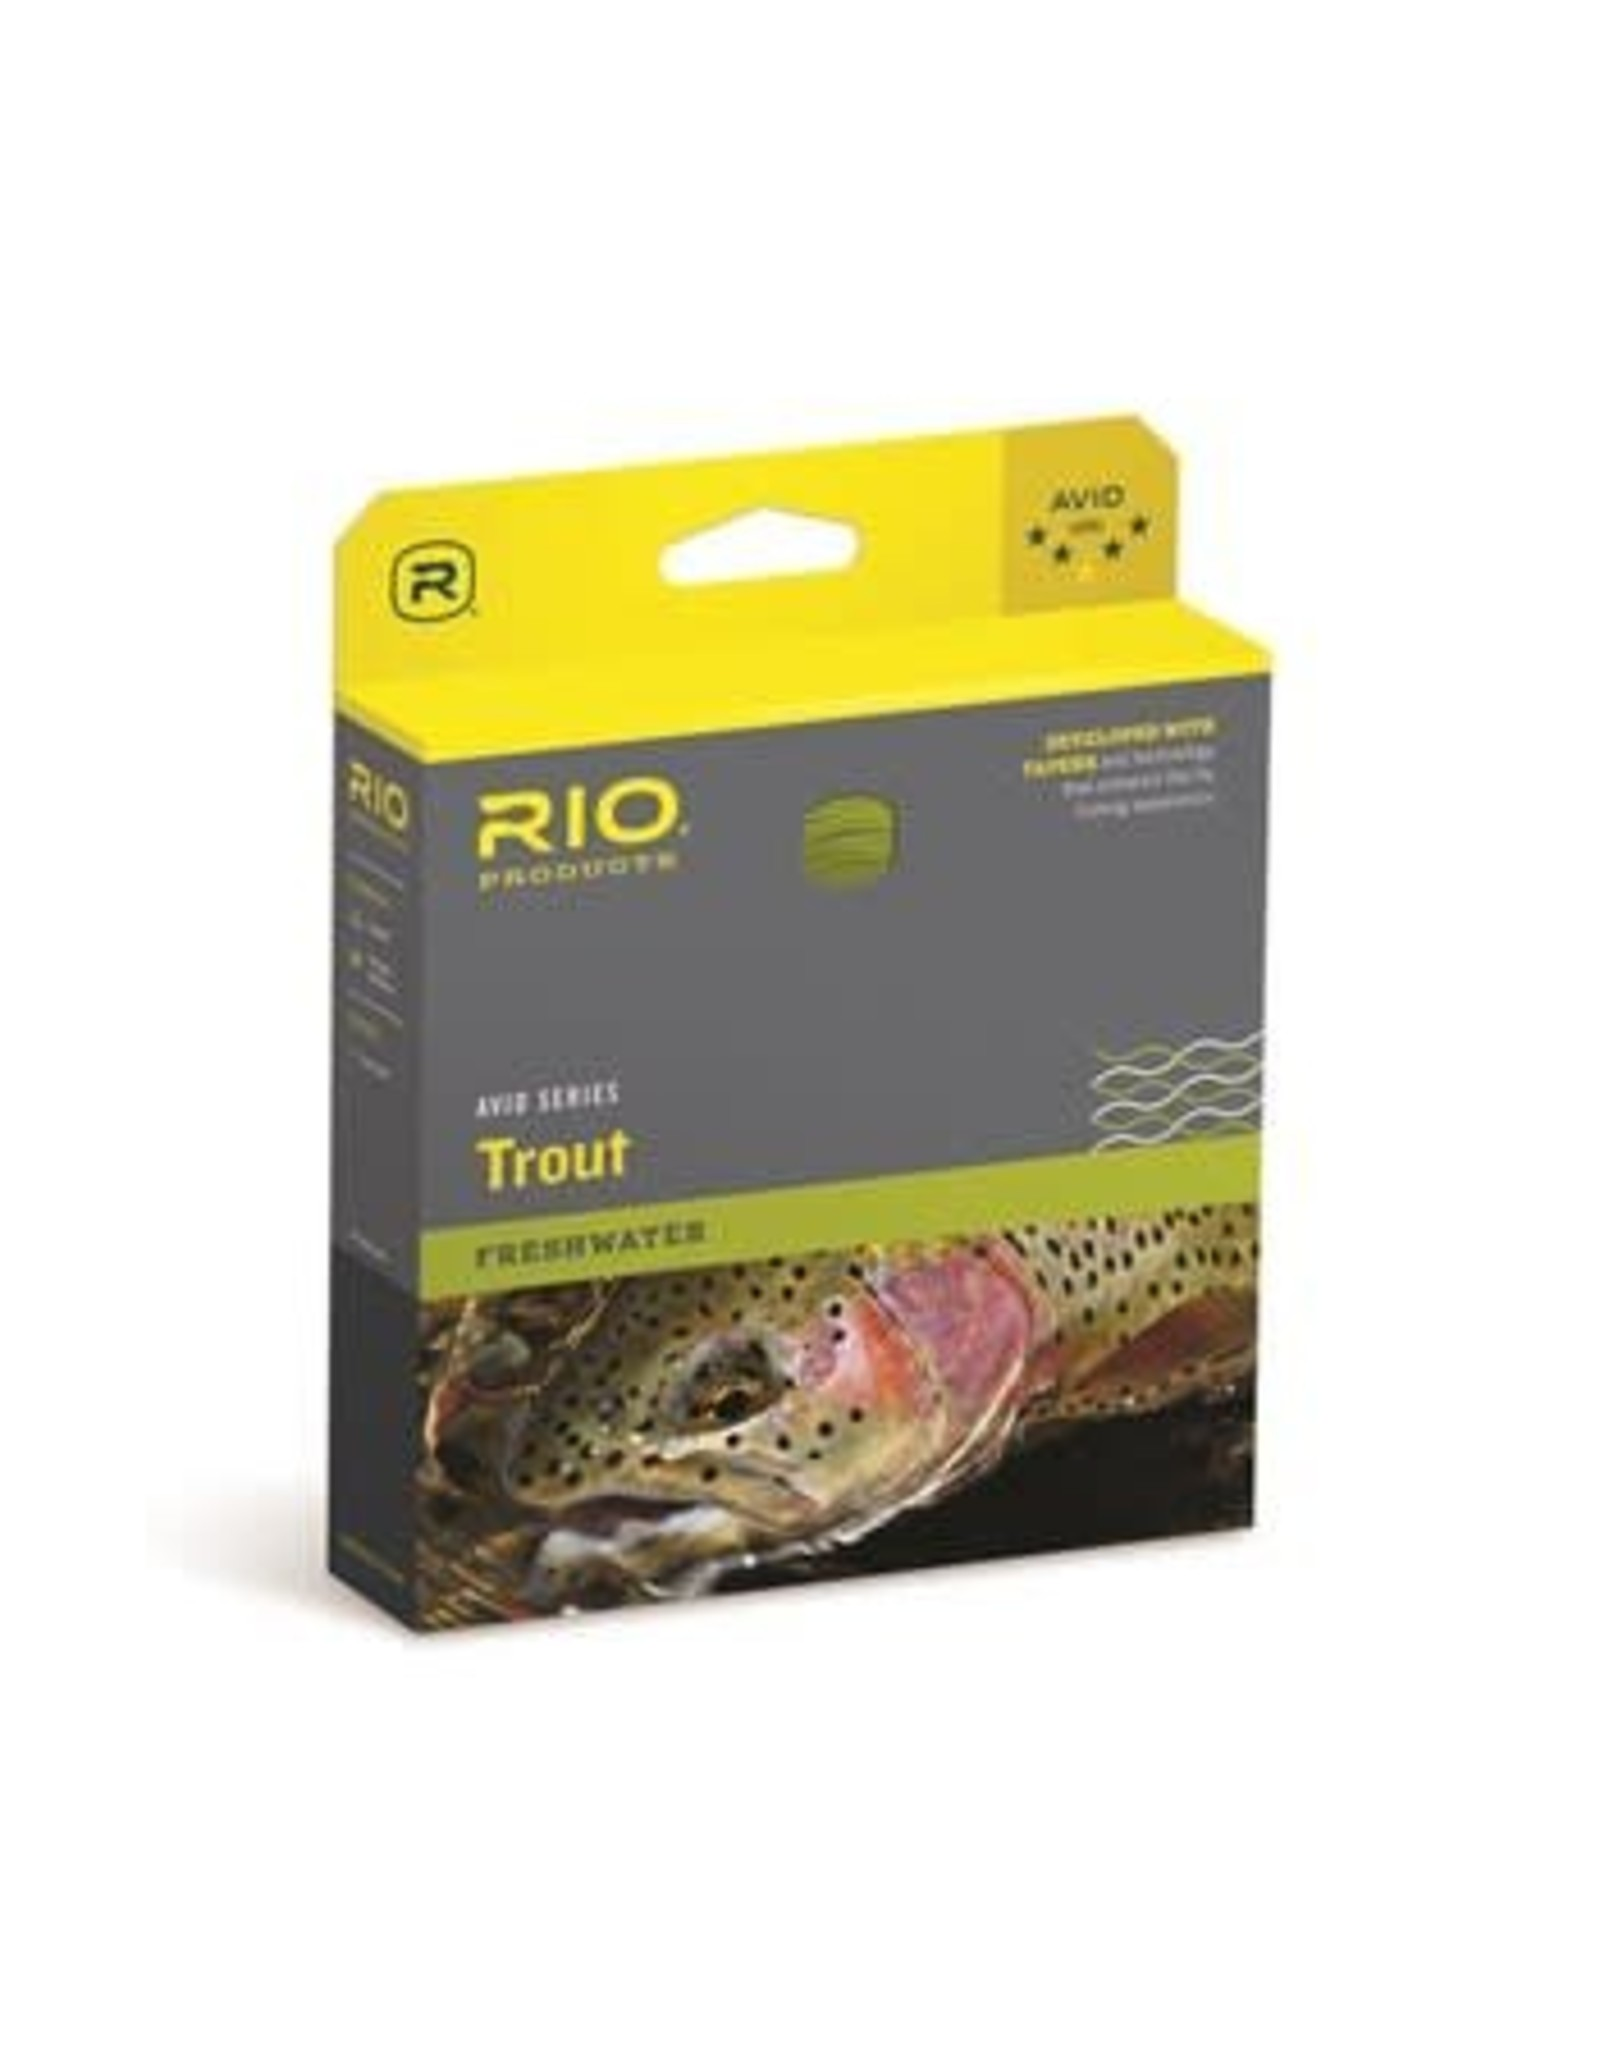 Rio Avid